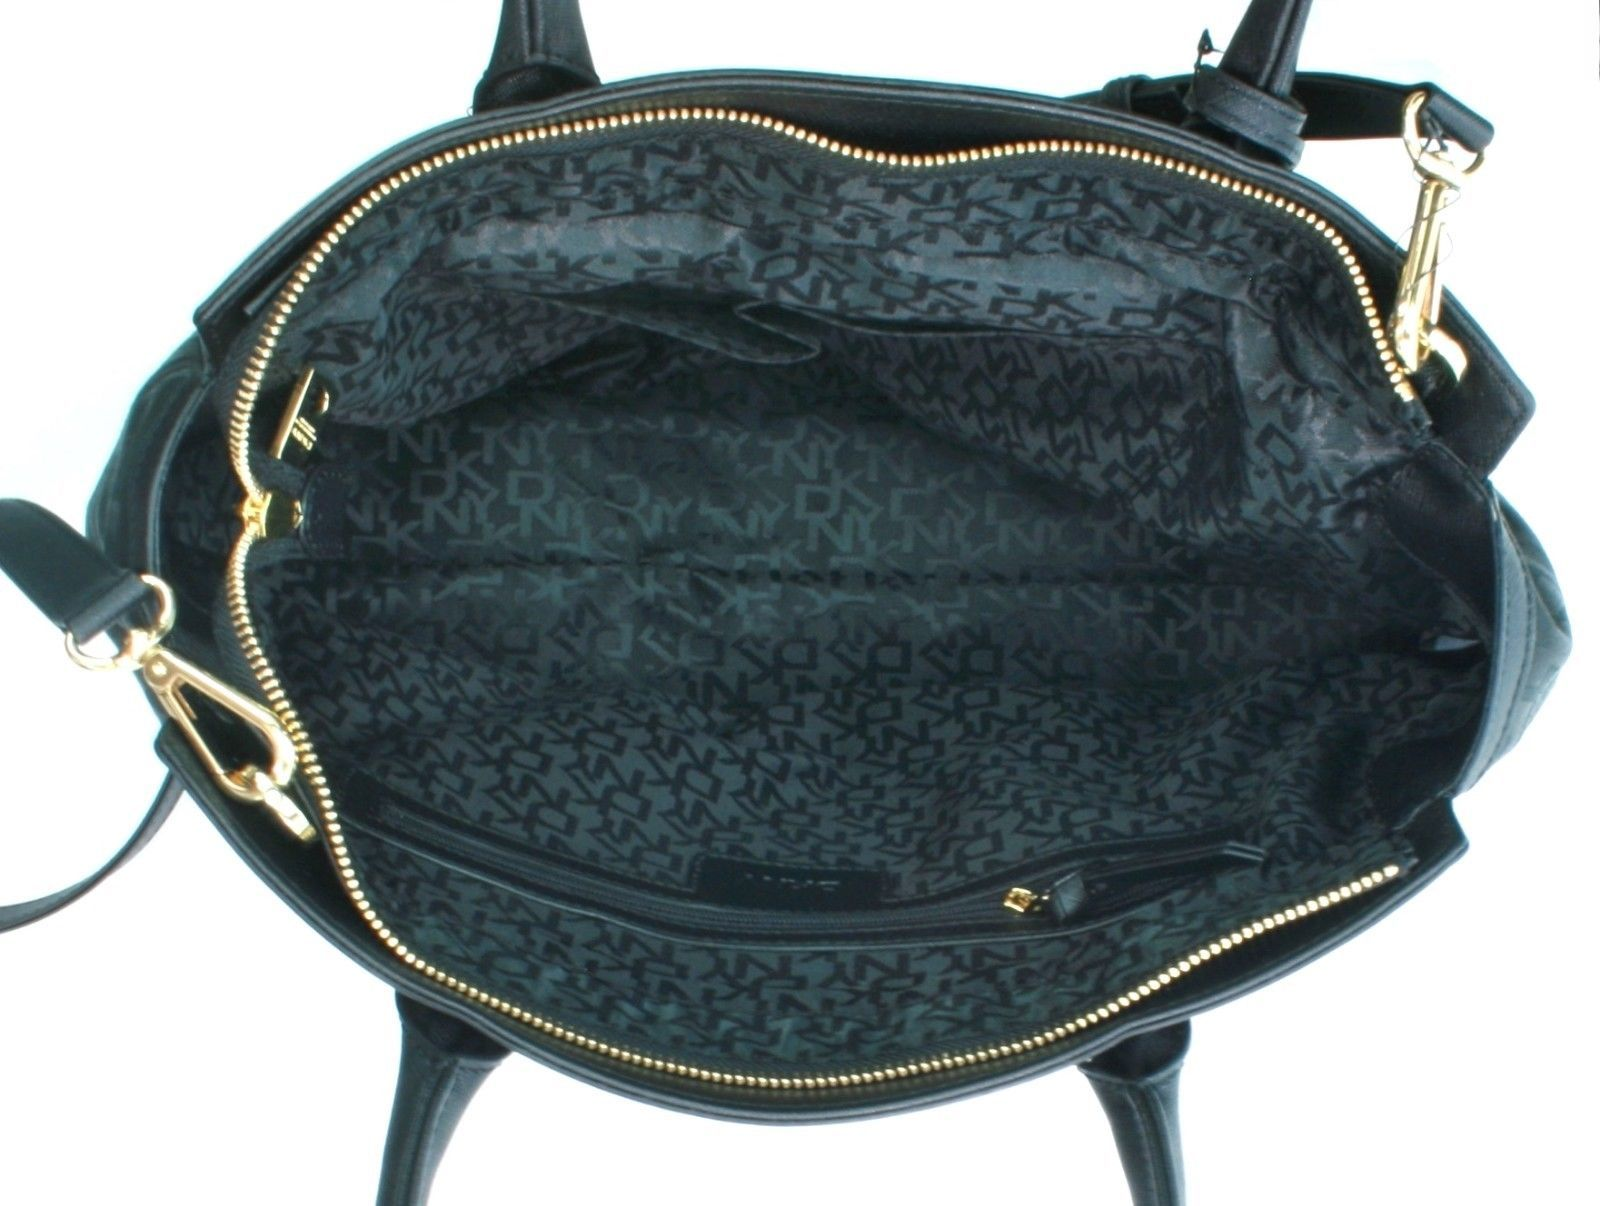 DKNY Donna Karan Black Leather PVC Heritage Tote Cross Body Bag Handbag RRP £275